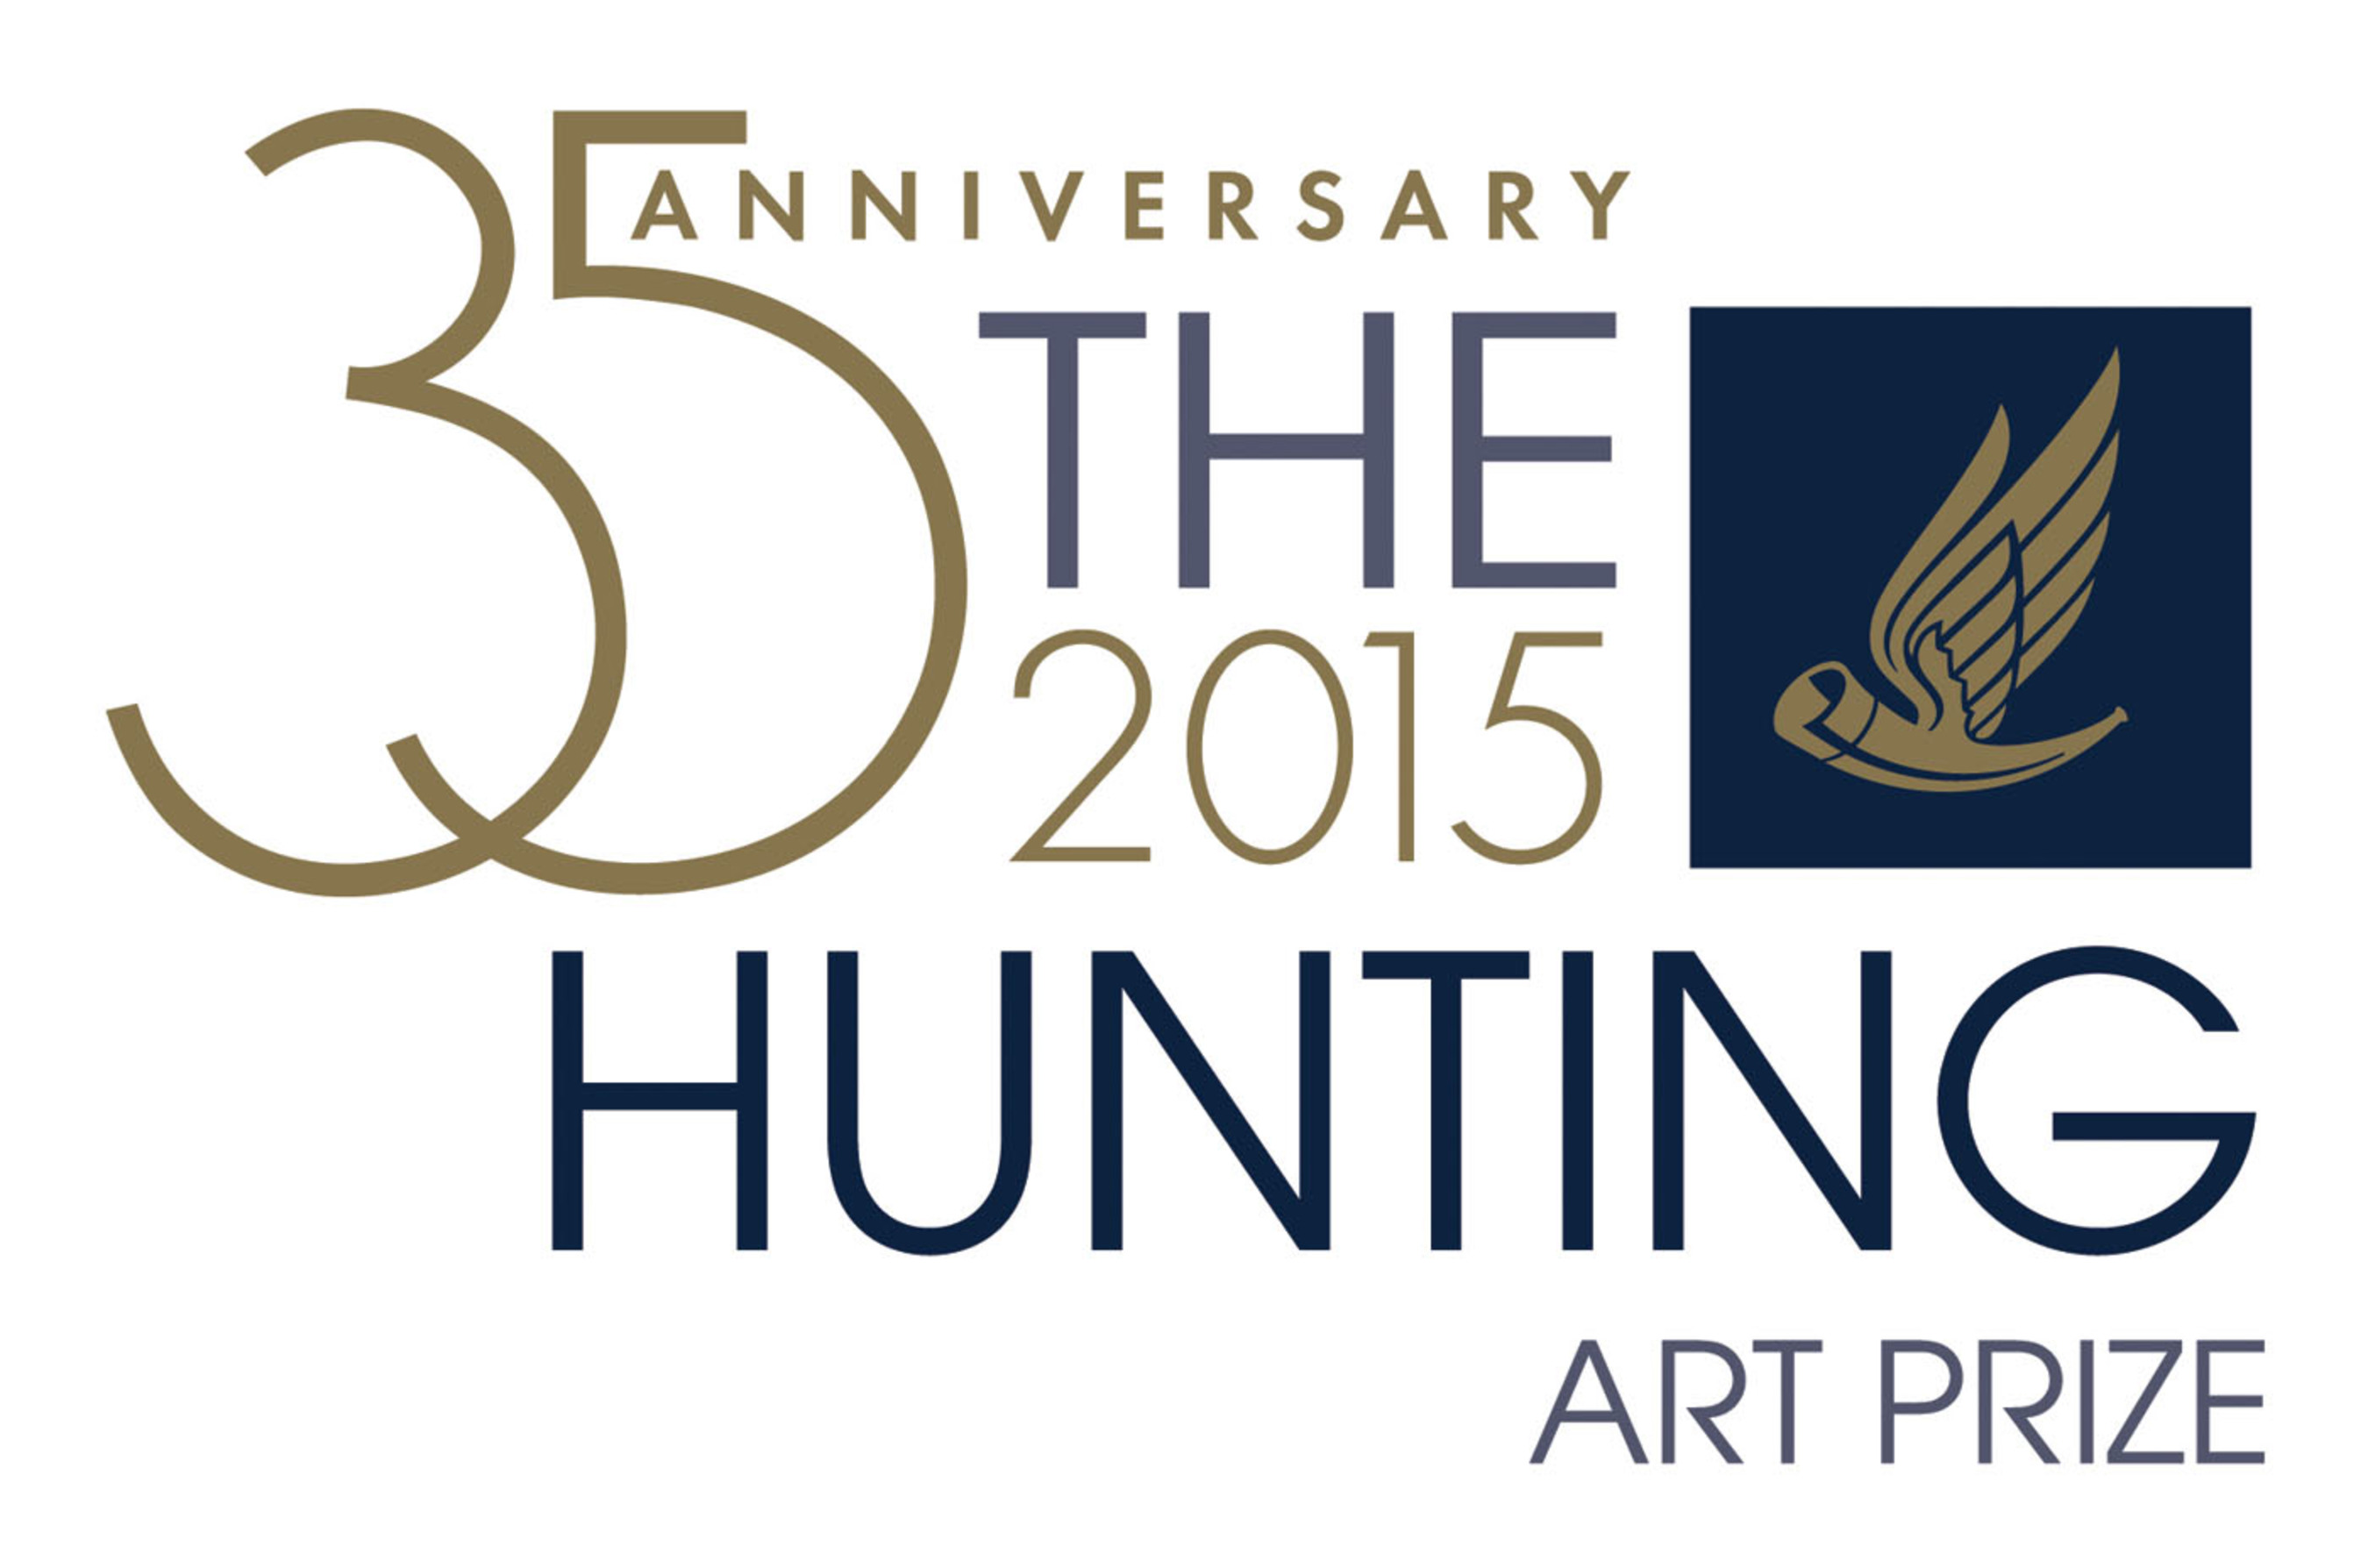 2015 Hunting Art Prize.